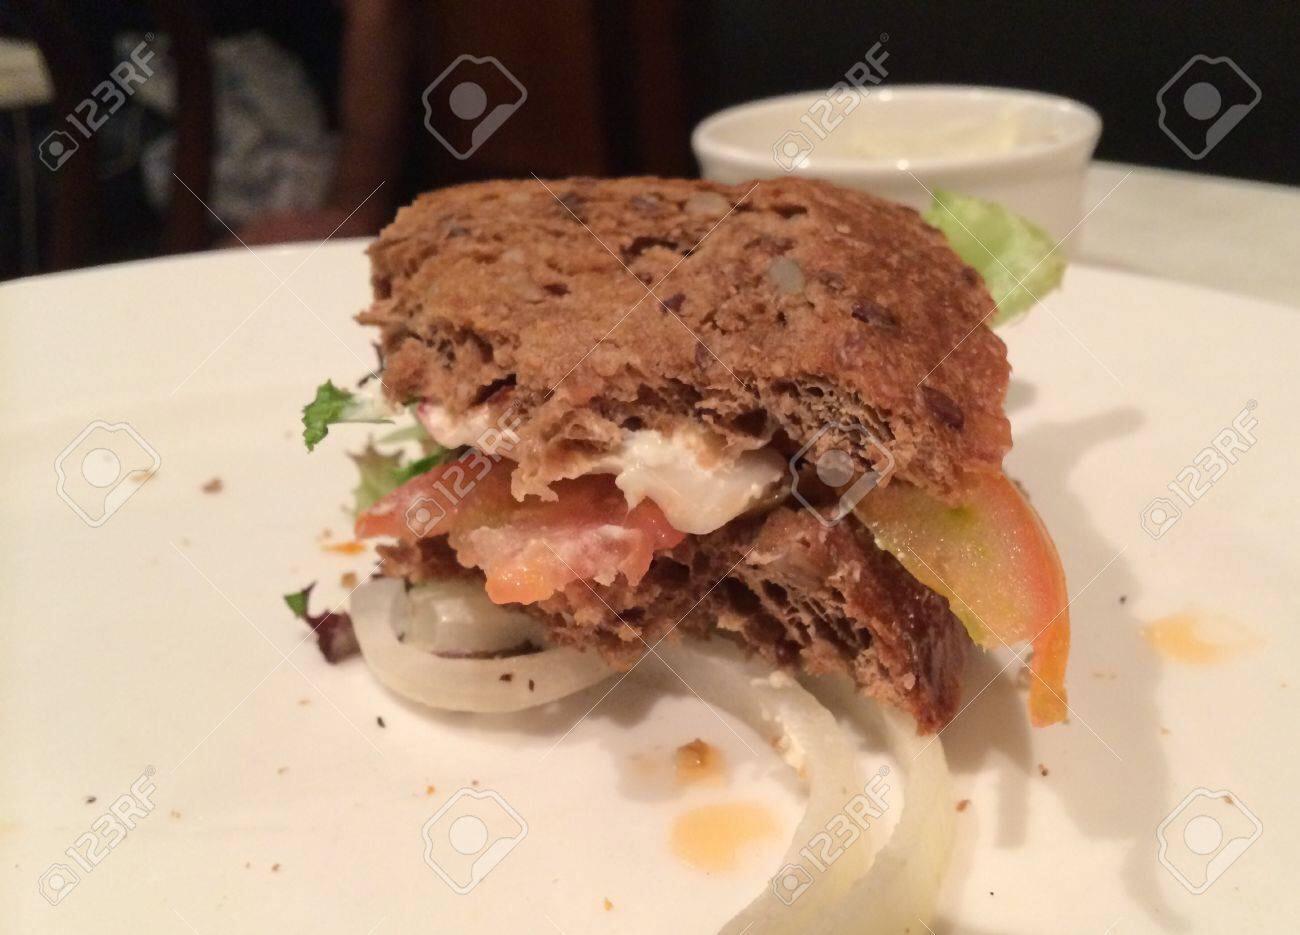 Dal sito https://it.123rf.com/photo_26632951_panino-mezzo-mangiato.html